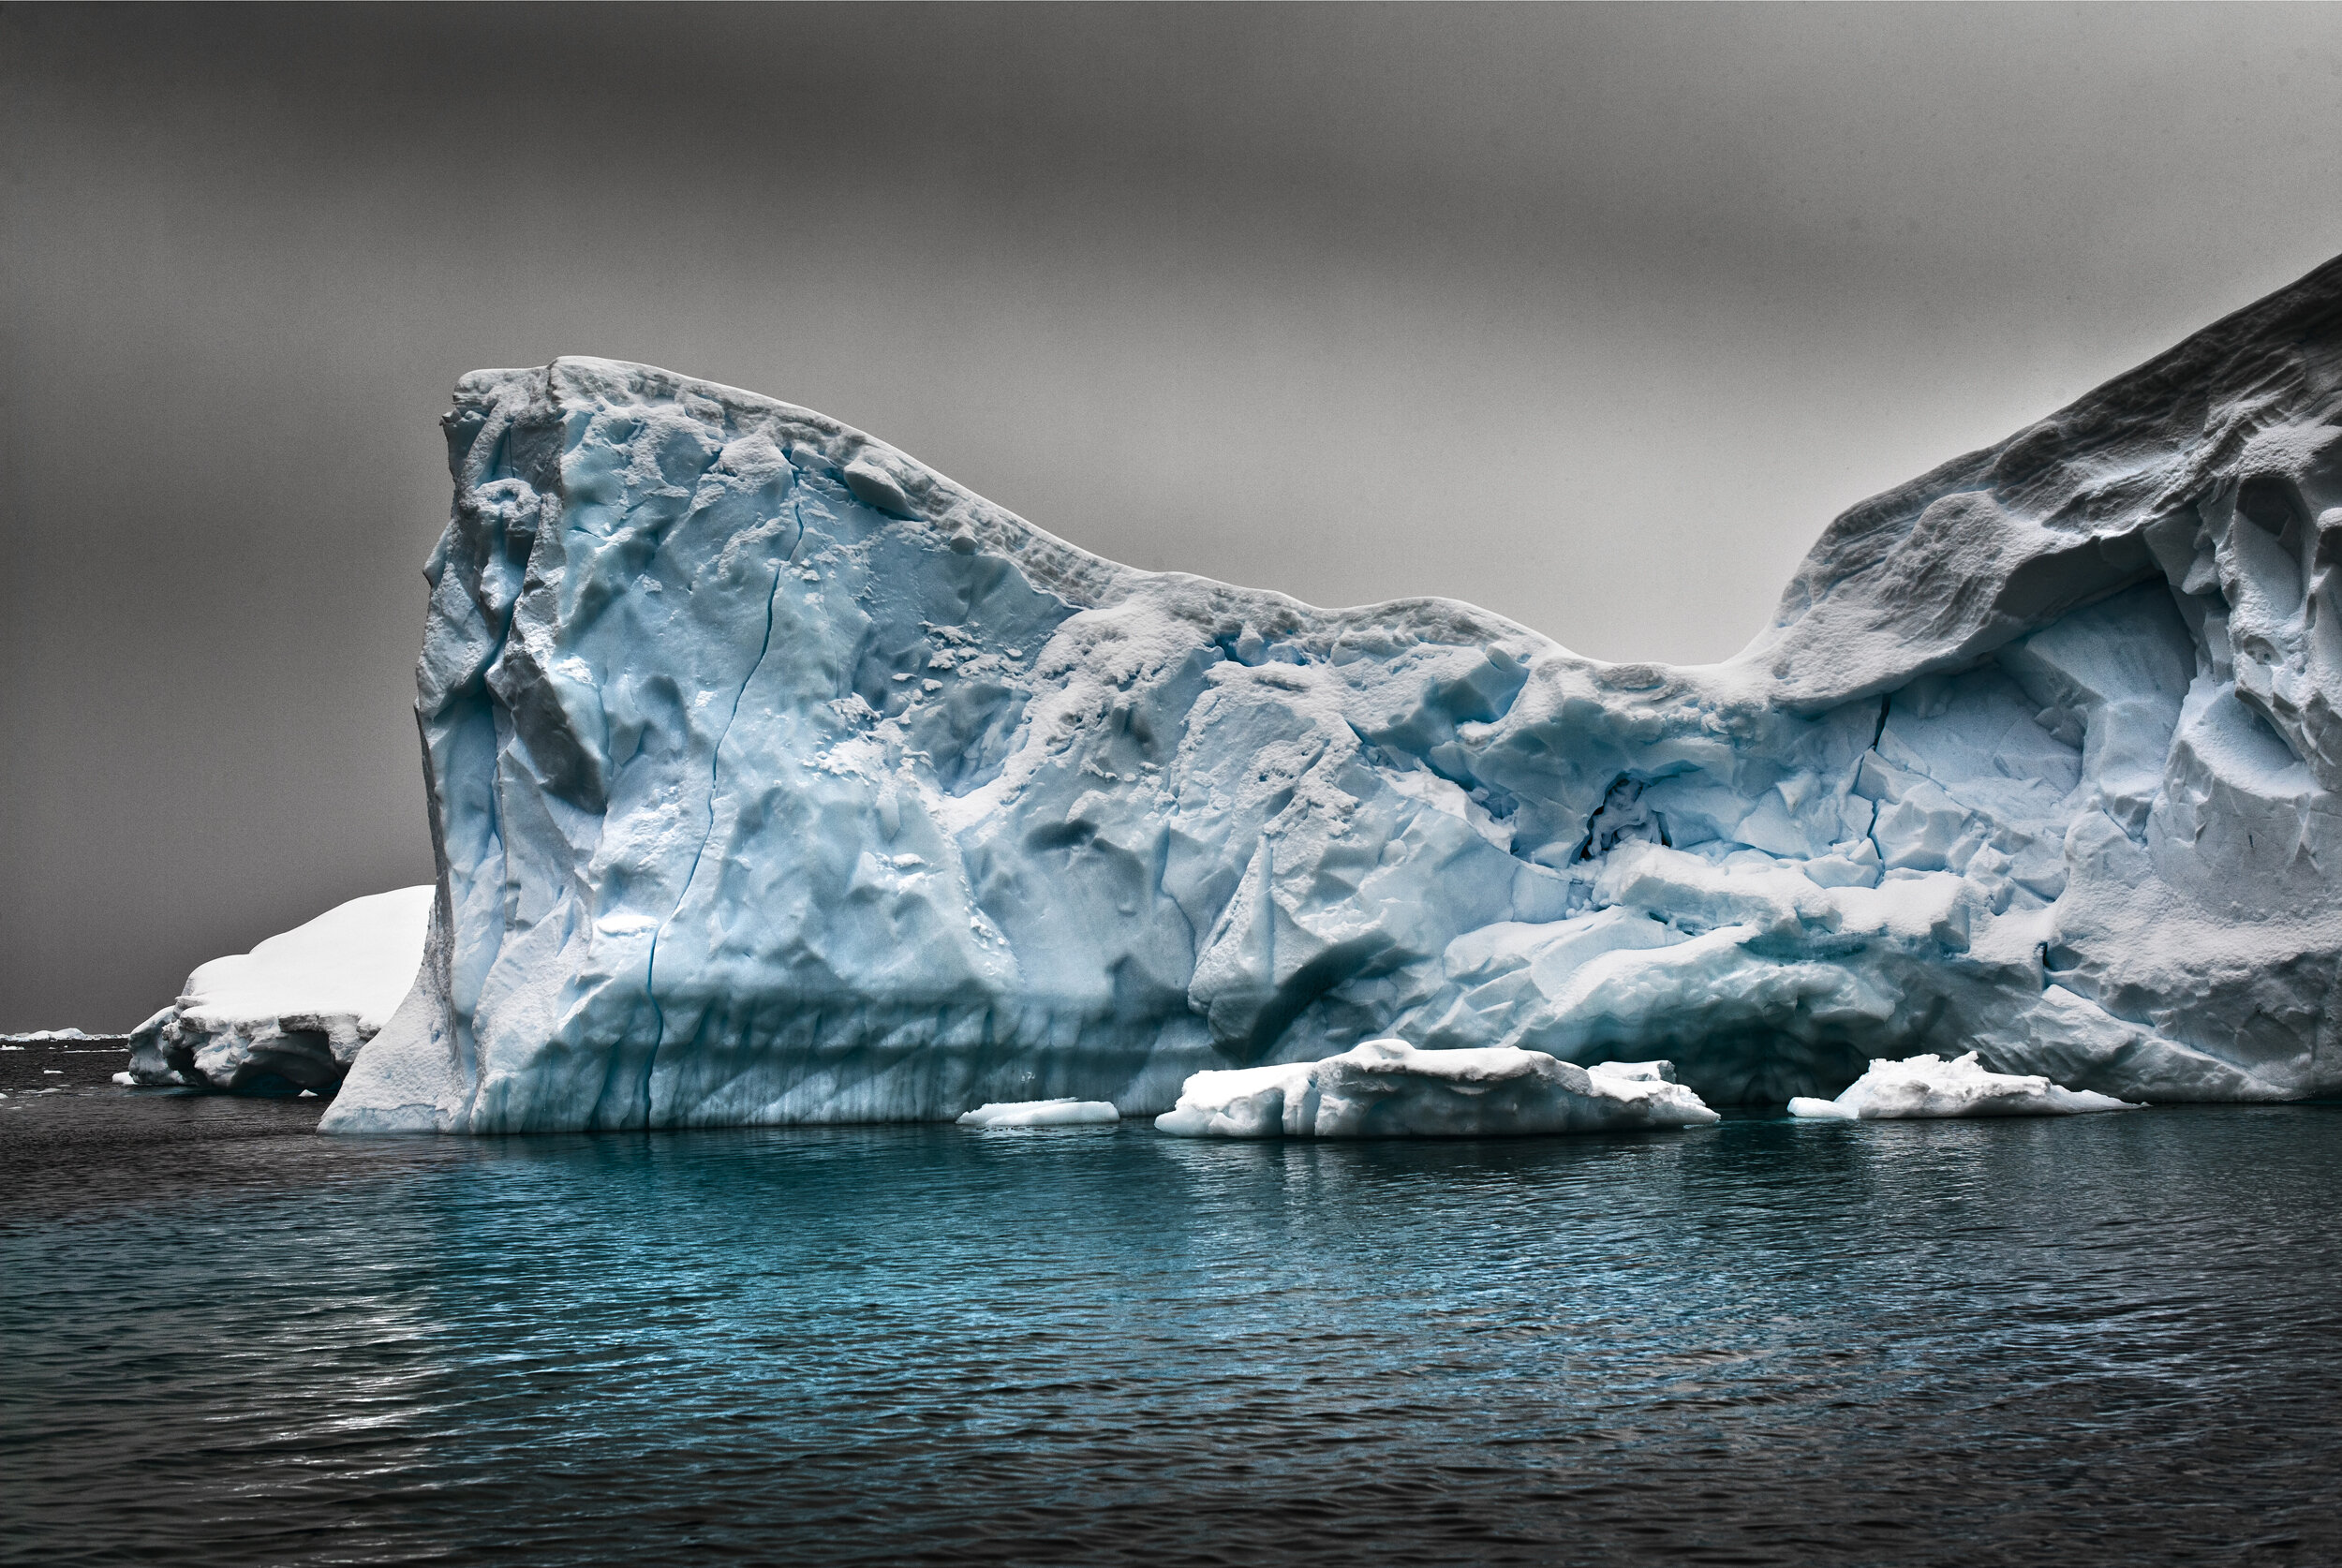 manuel_uebler_antarctica_twilight_008.jpg